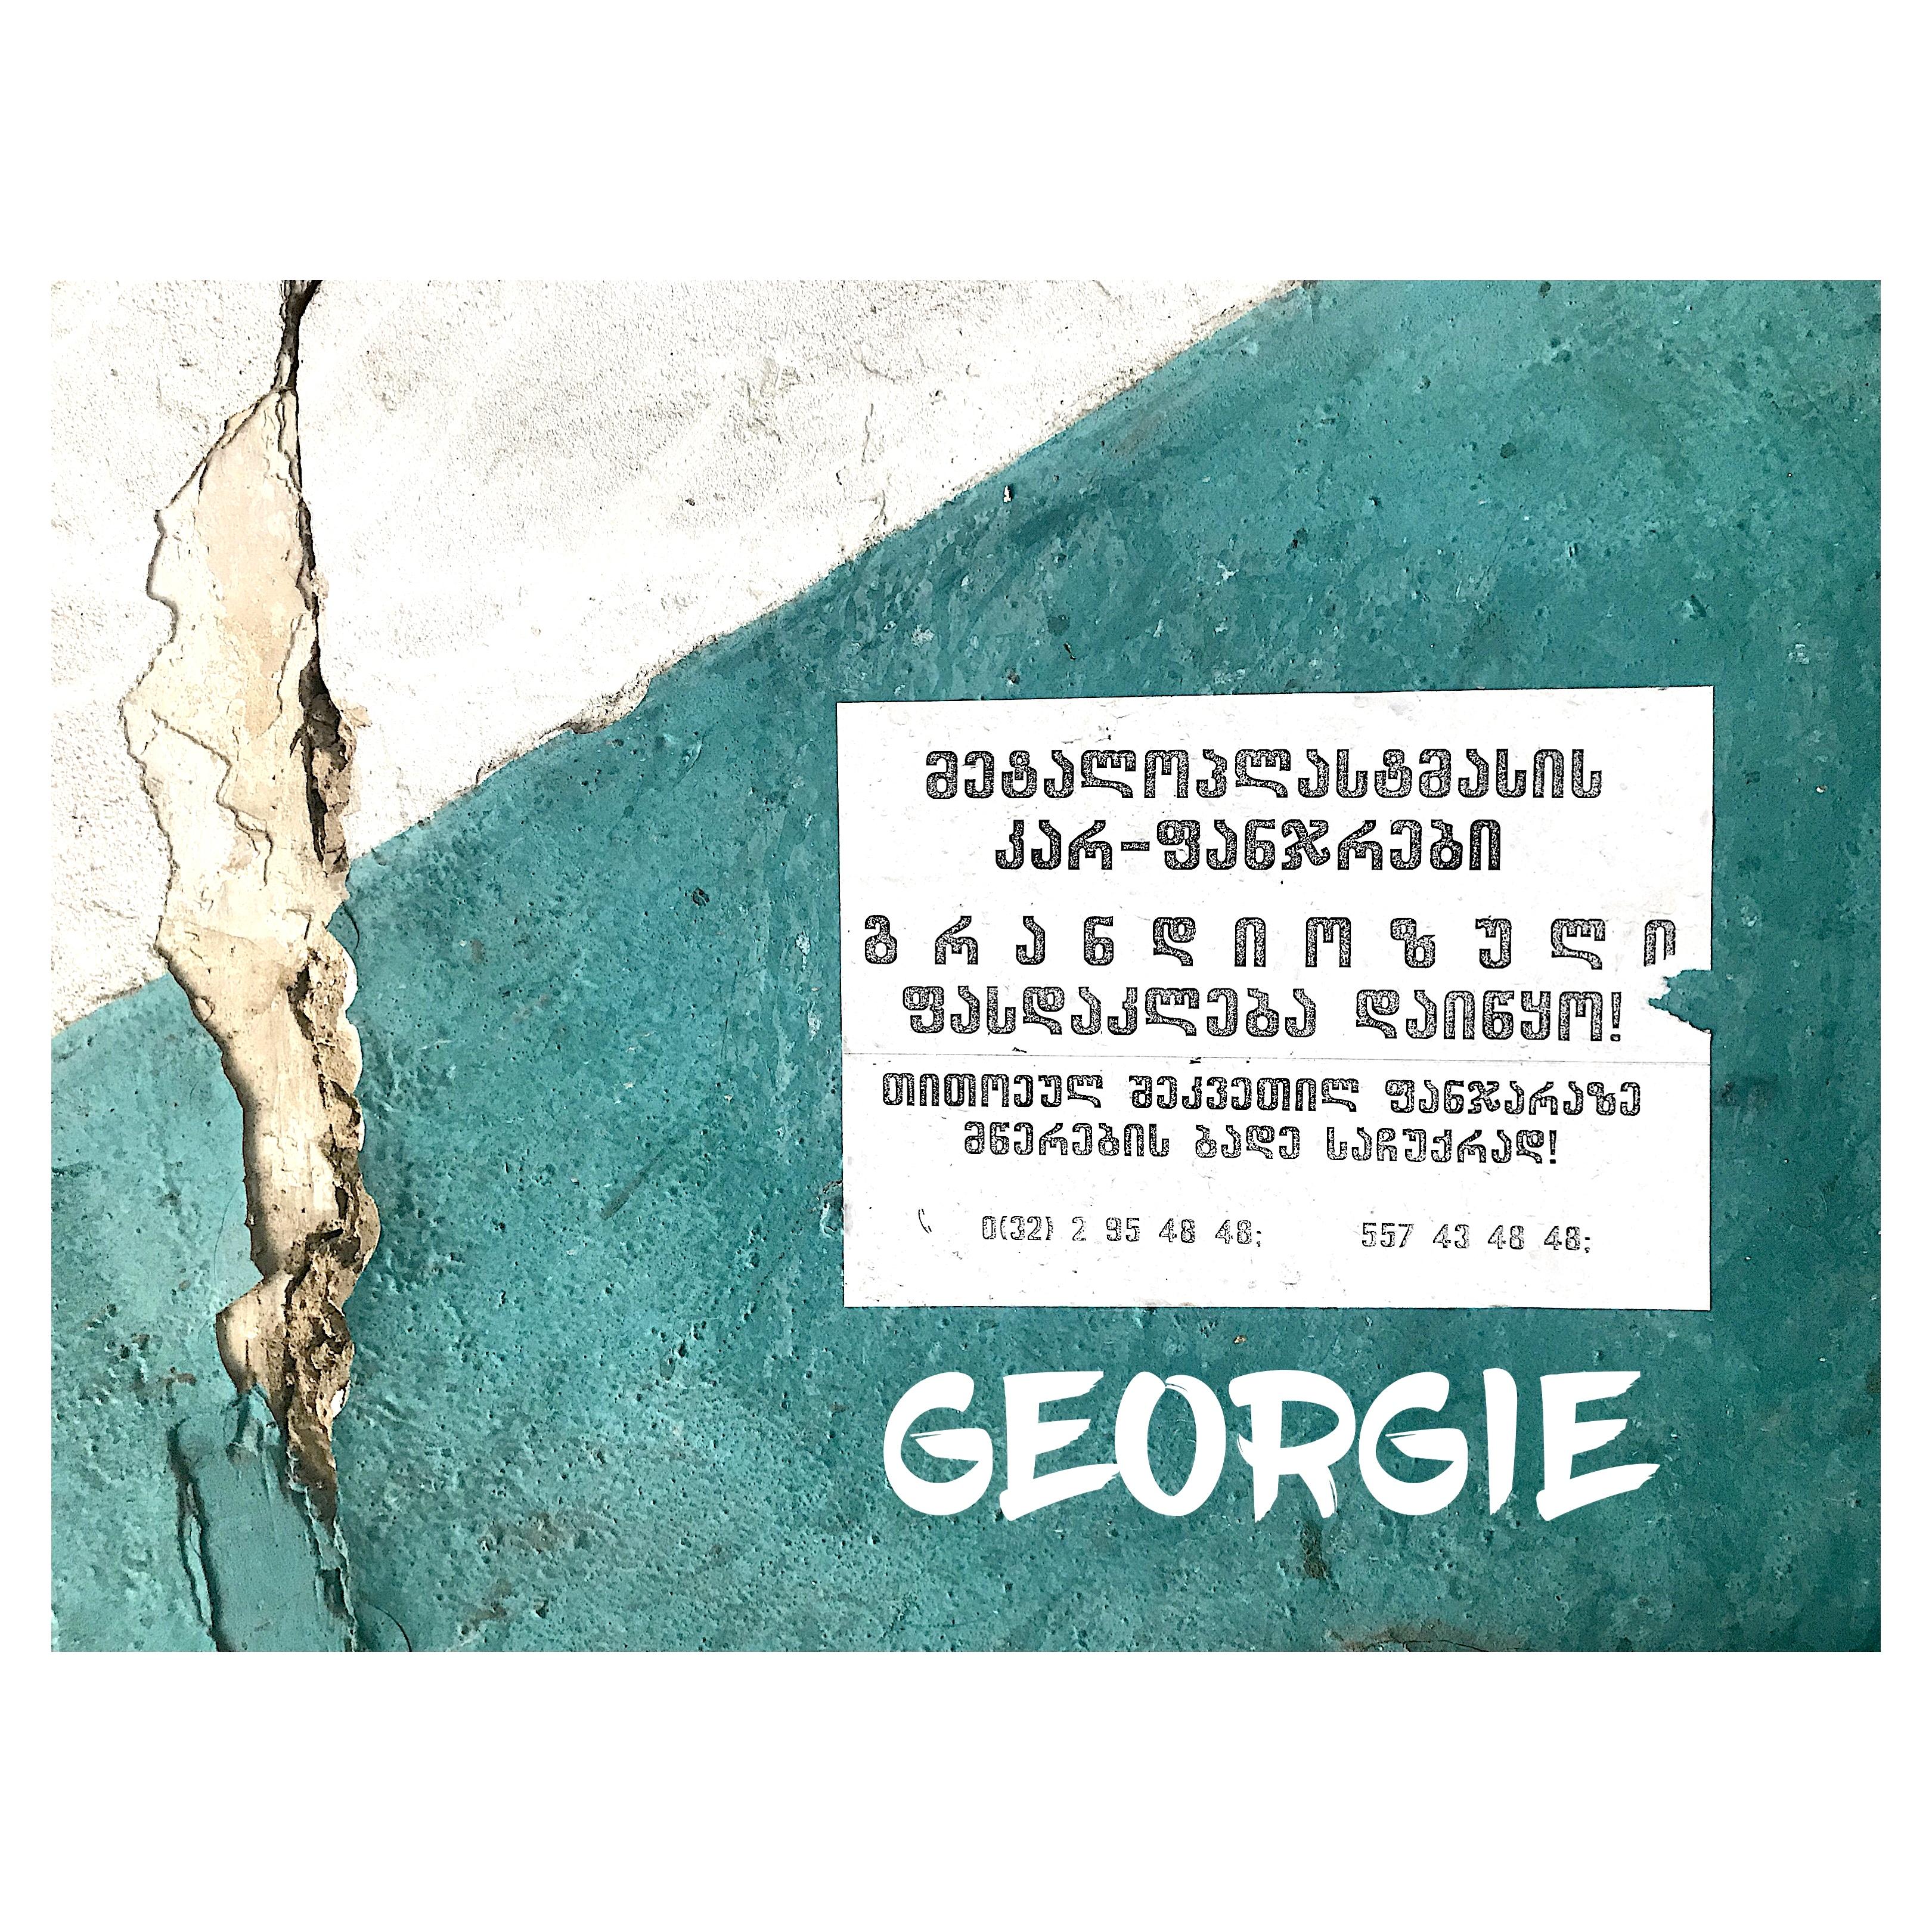 ecriture georgienne, bienvenue en georgie a tbilissi